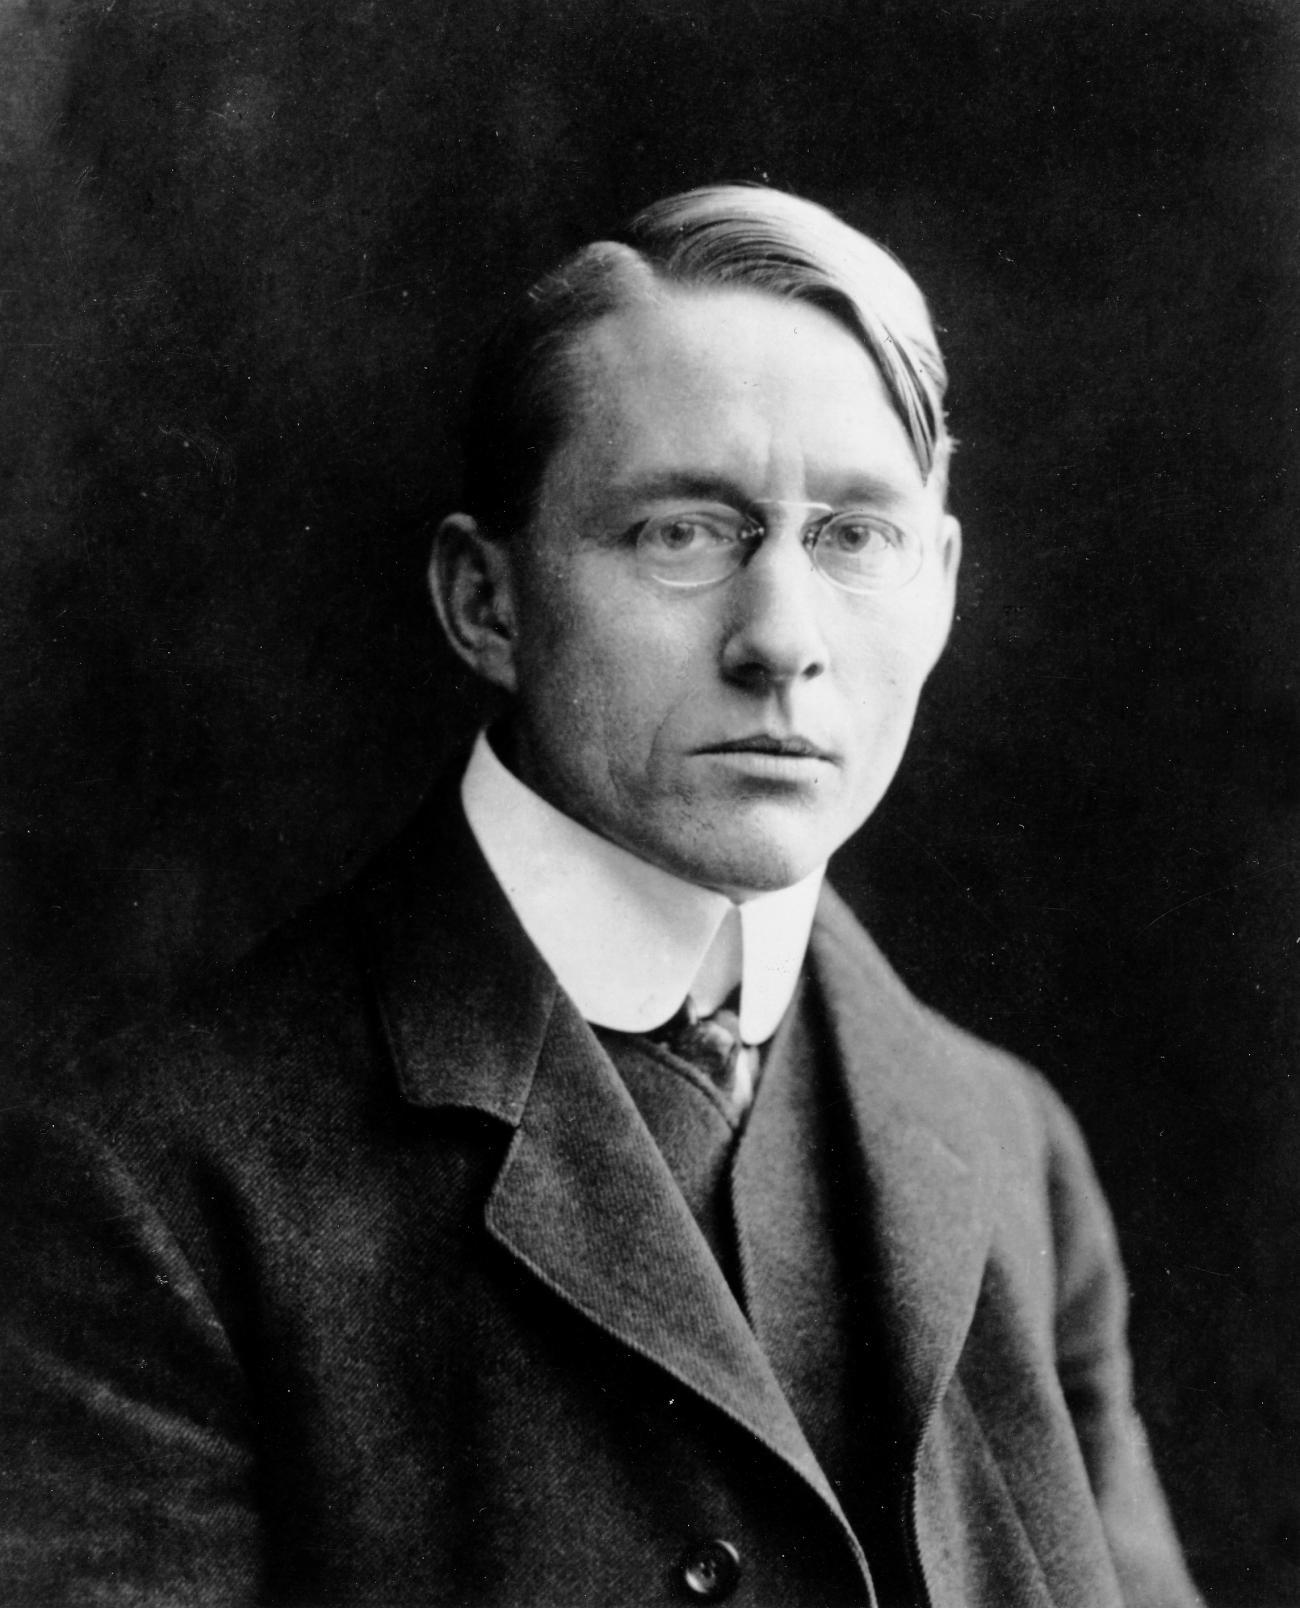 Carsten Jensen: Johannes V. Jensen var forslugen og umættelig på syner, verdener, viden, indtryk ...